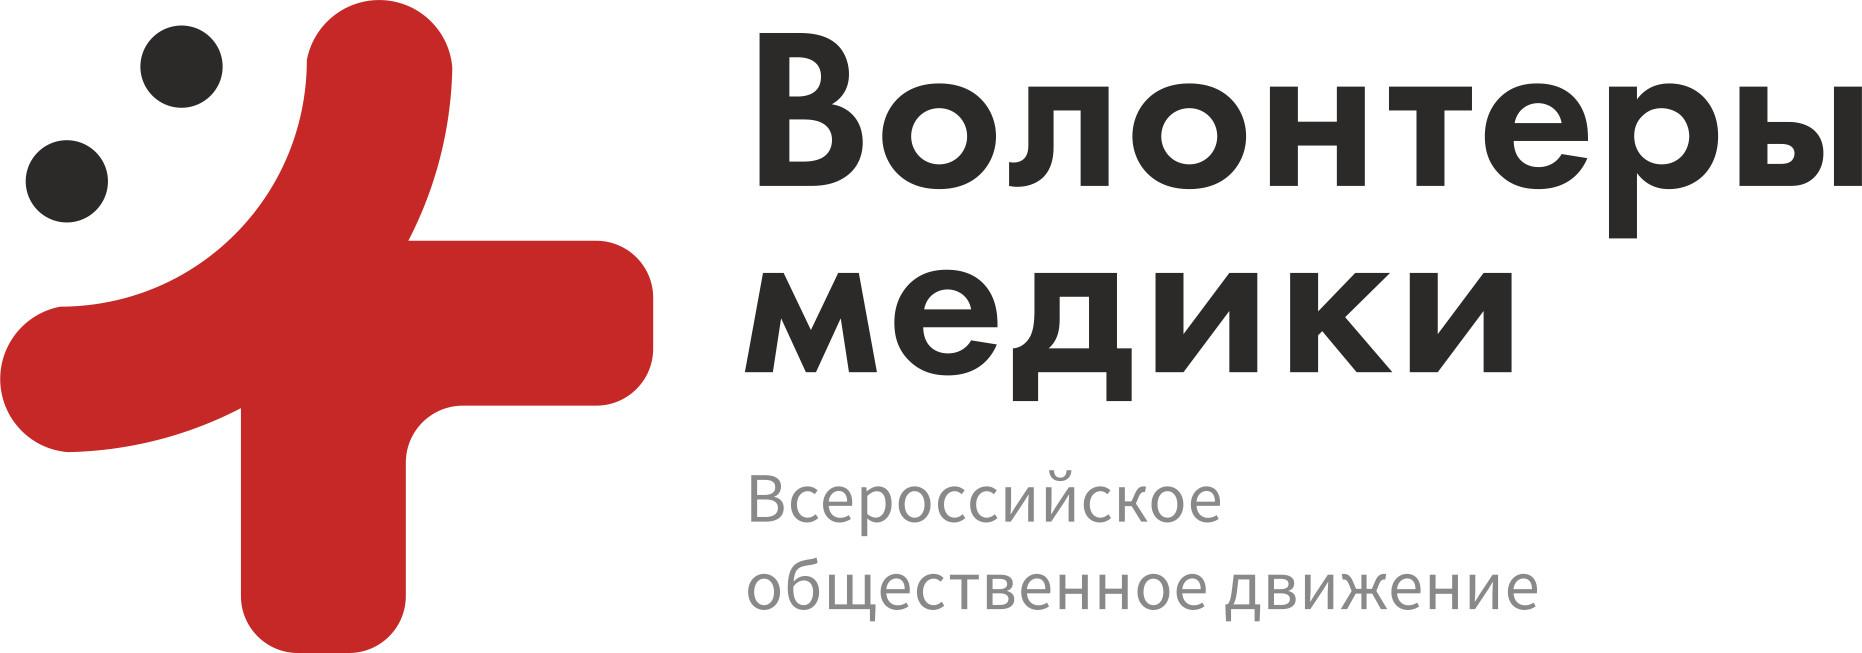 volontery_mediki.jpg